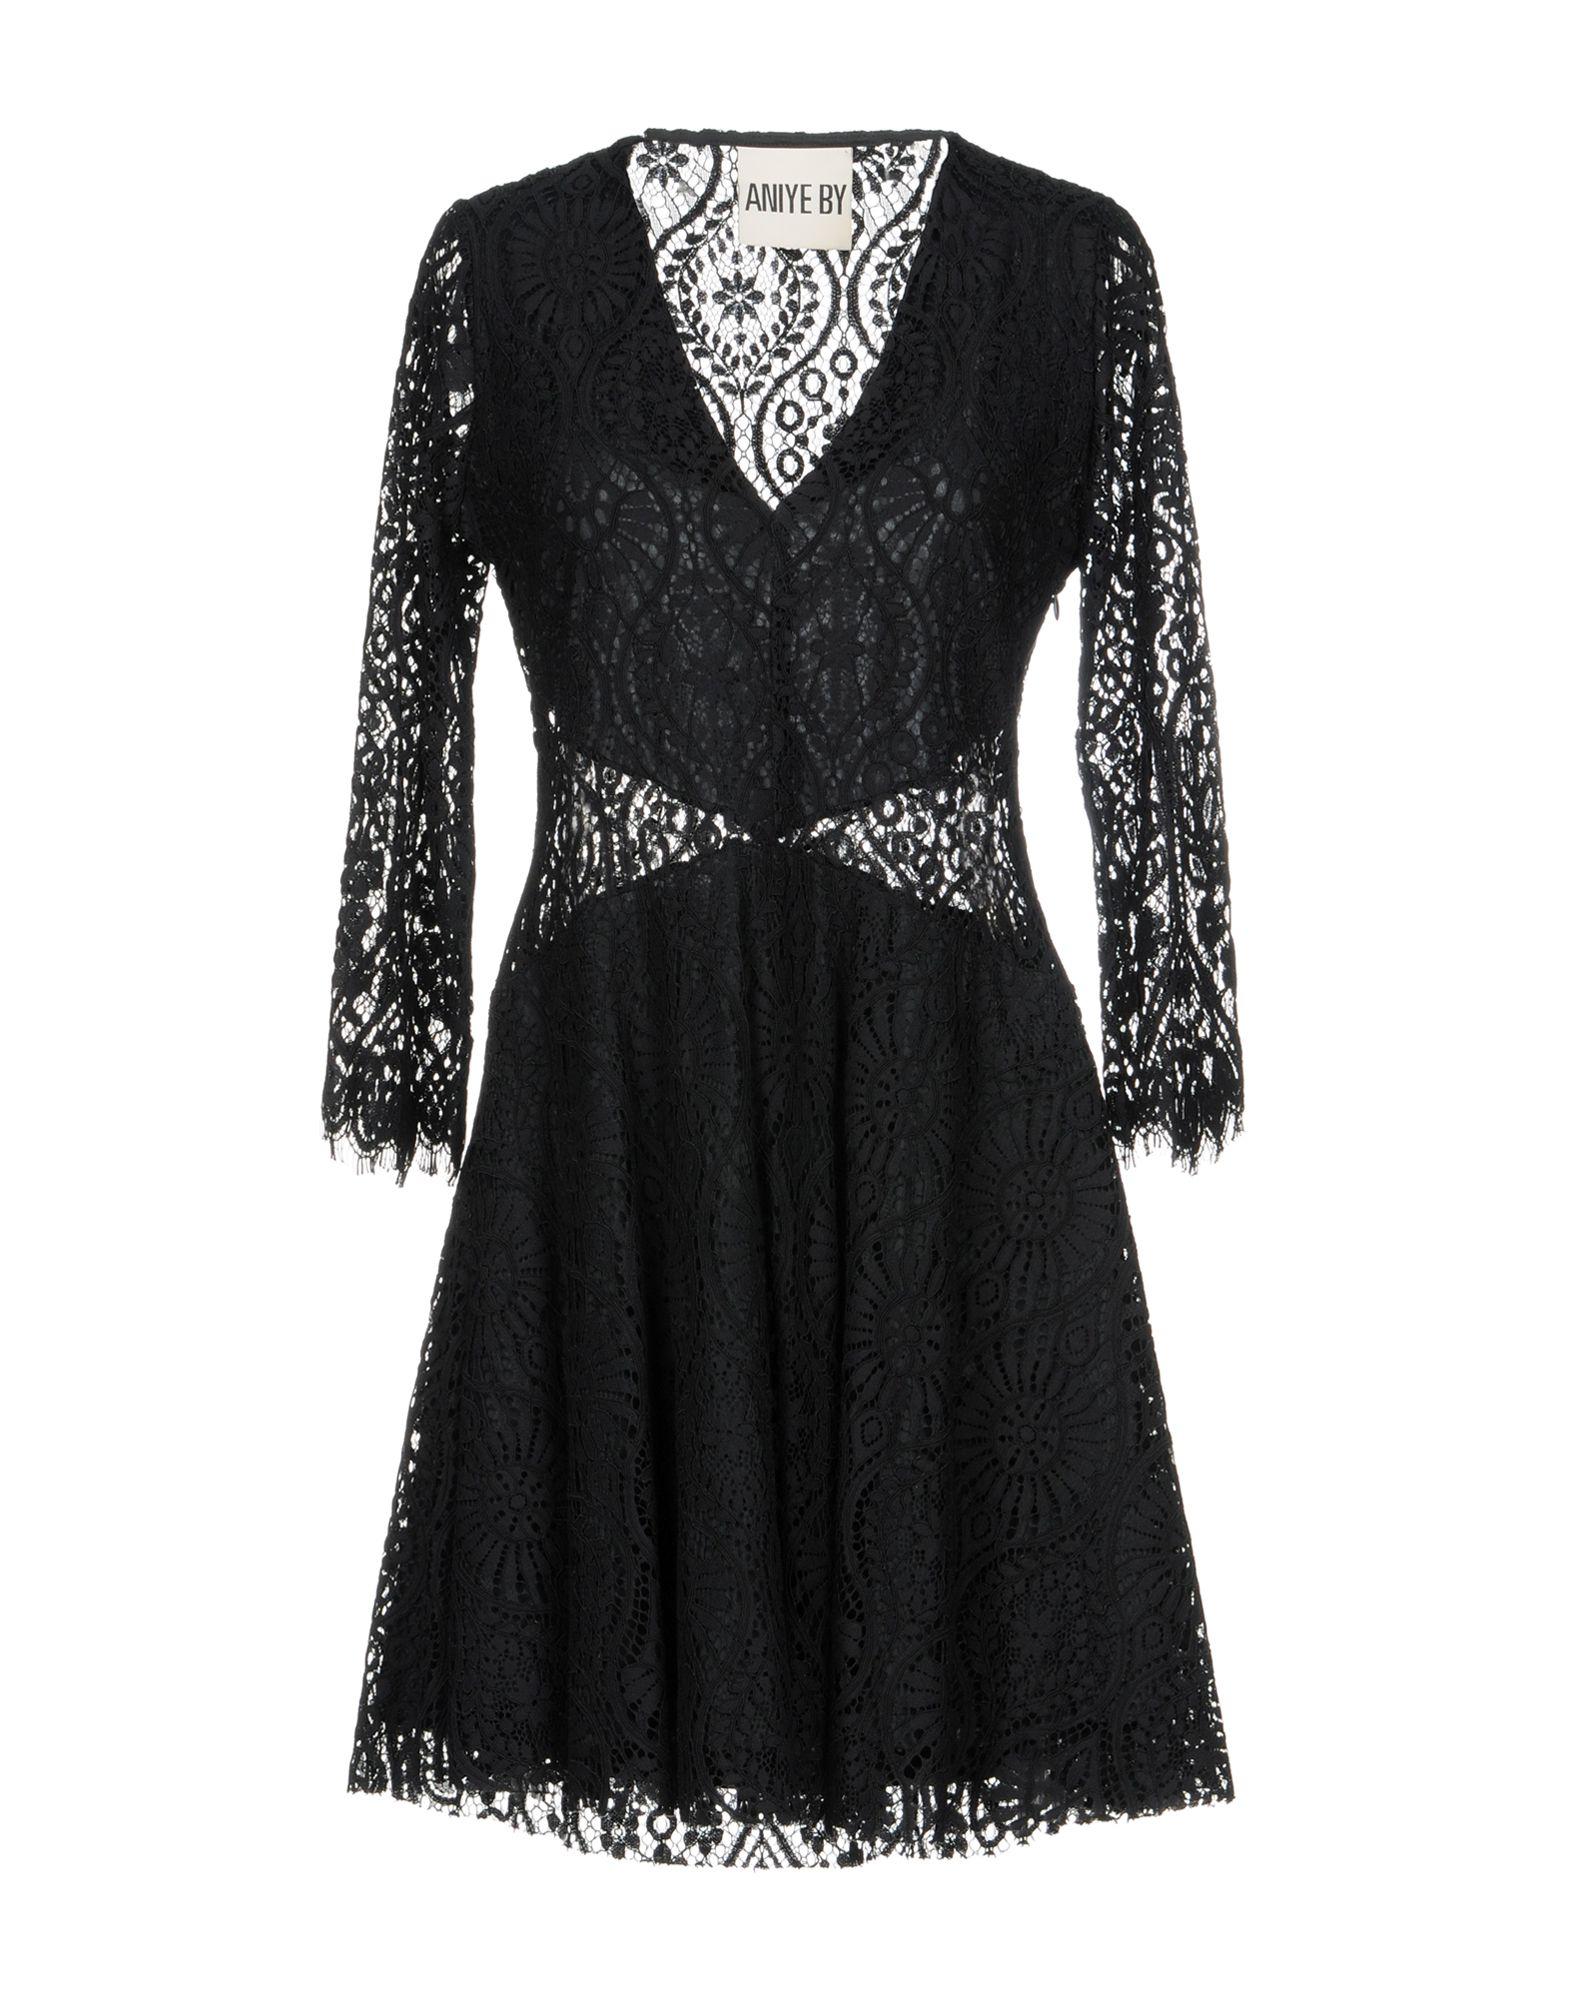 Vestito Corto Aniye By Donna - Acquista online su FyhNR2